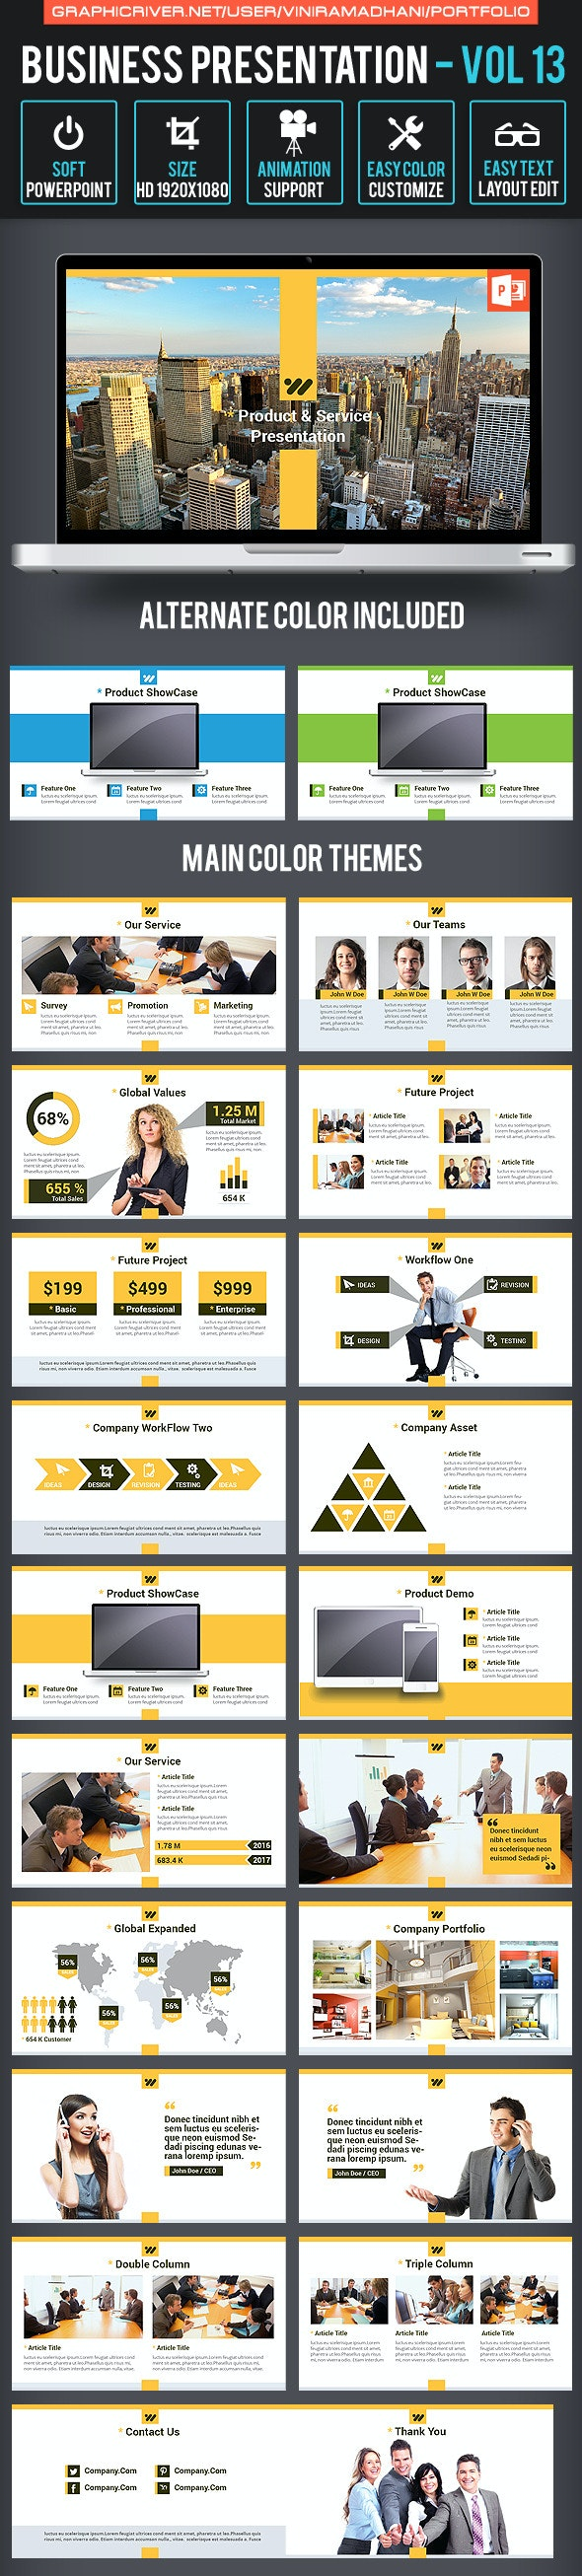 Business Presentation Volume 13 - Business PowerPoint Templates